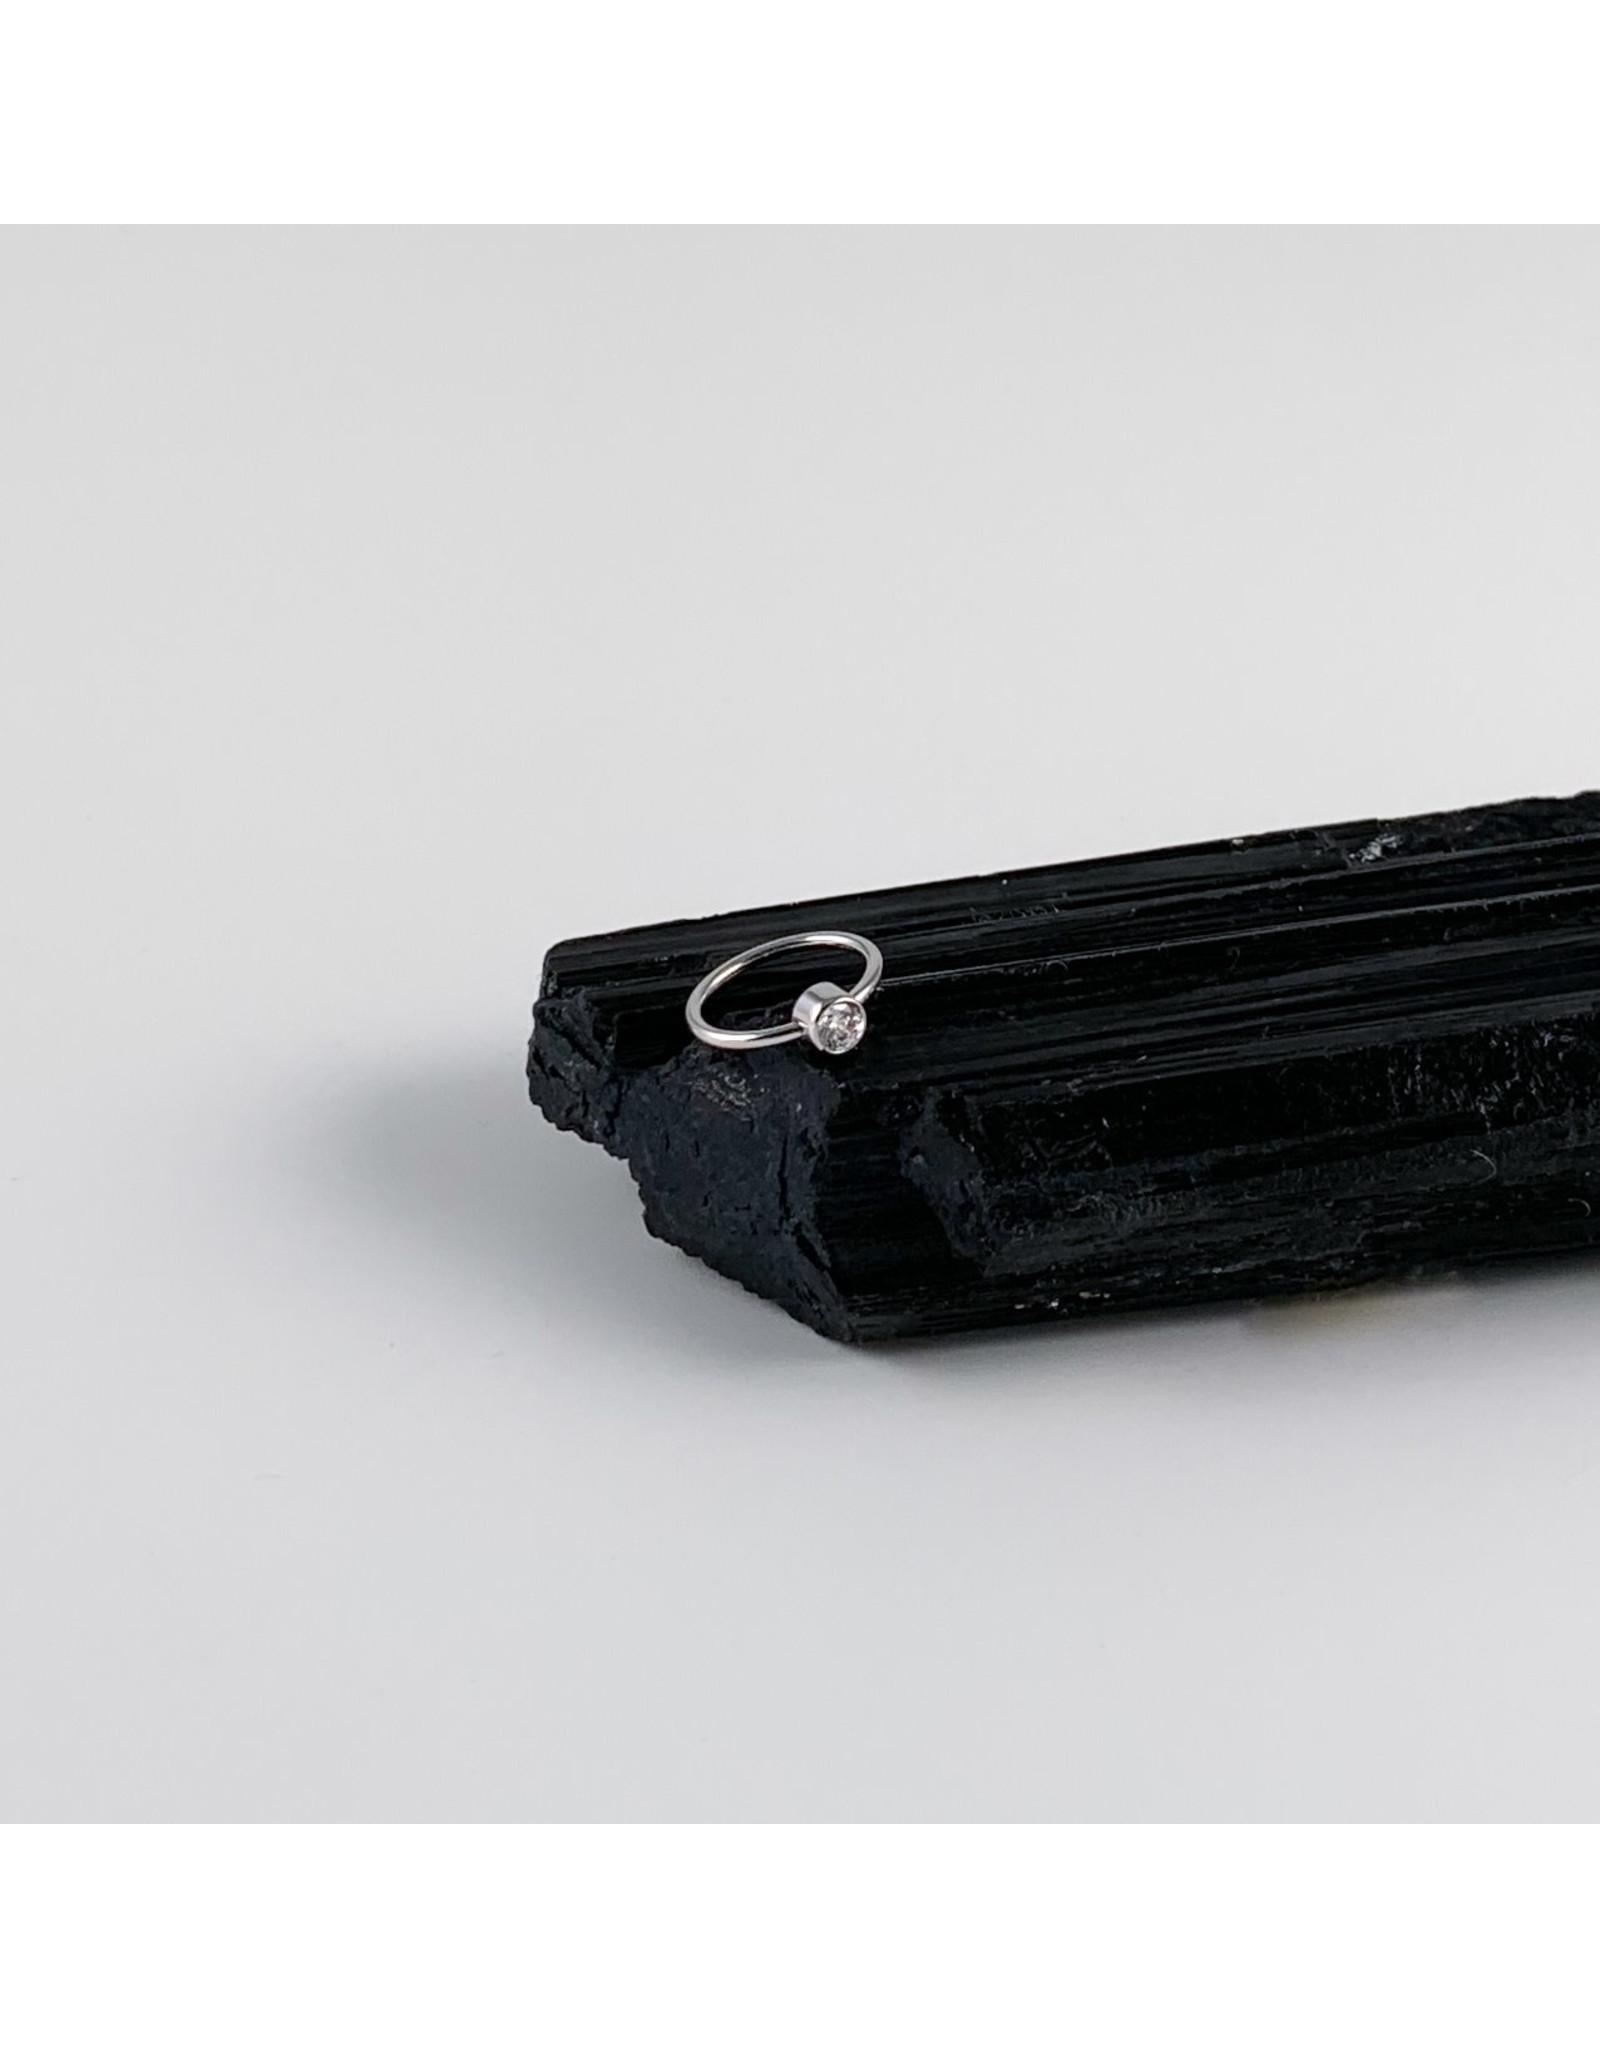 BVLA BVLA 16g 2.5 CZ Fixed Bezel Ring. Navel Orientation.